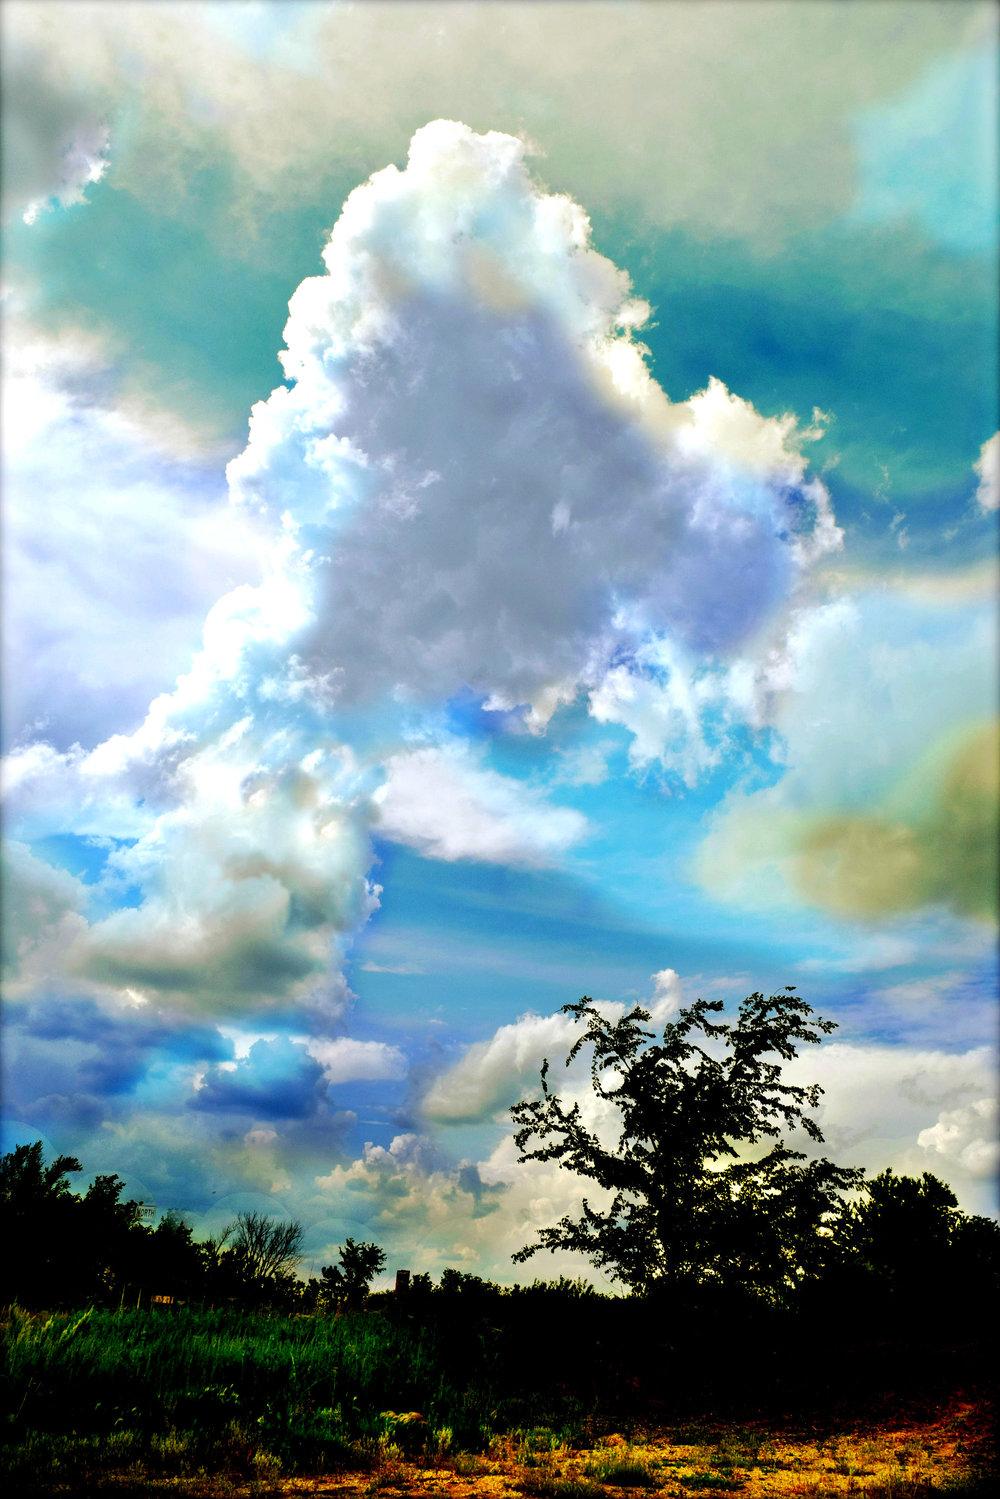 Clouds near Kalona Maggie Burns 2016    11x17 $60, 13x19 $80, 8x11 $50